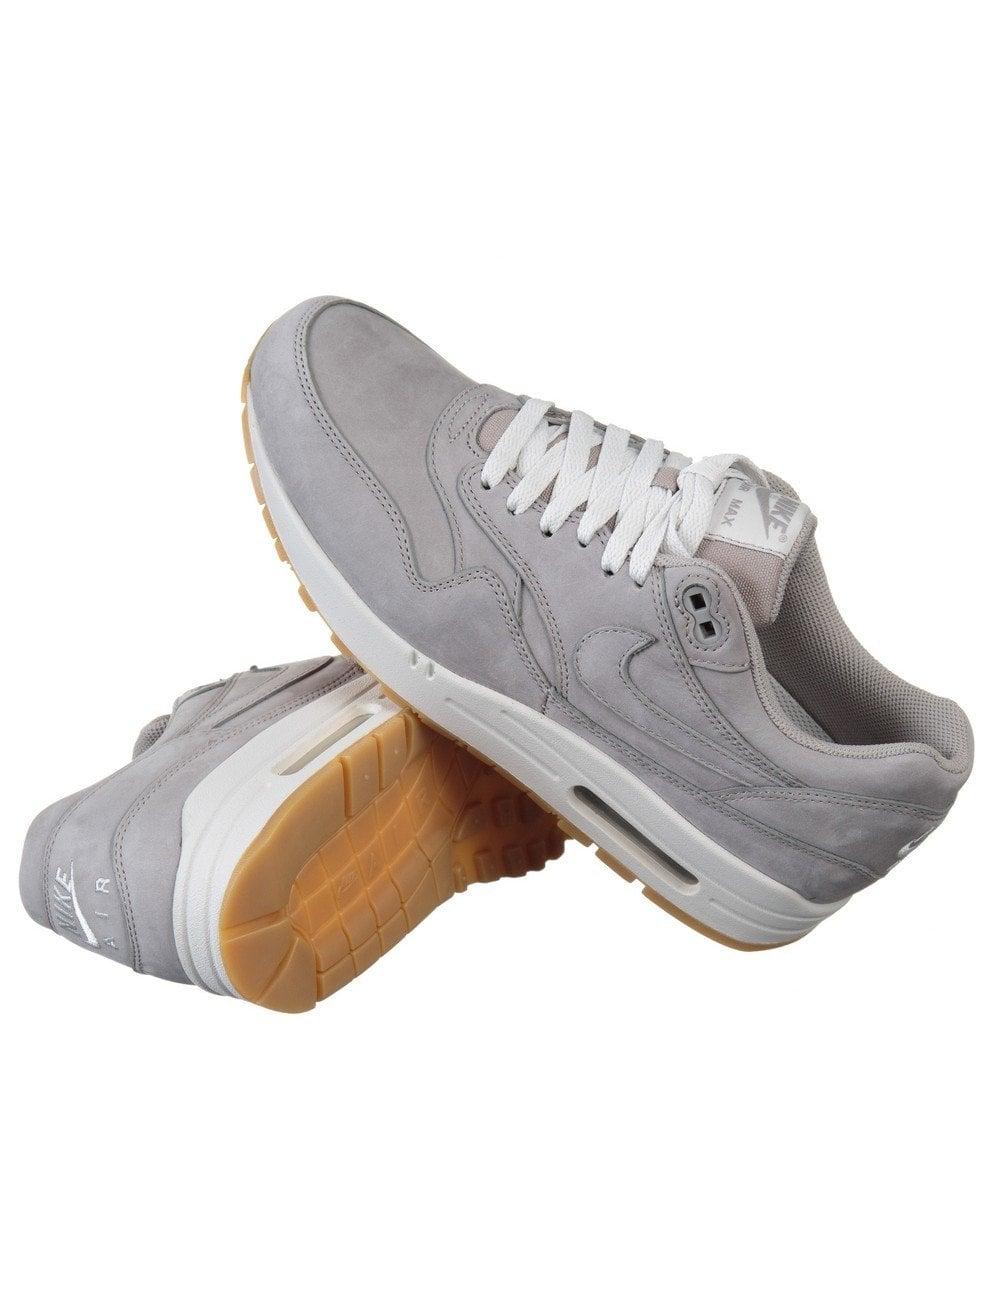 Air Max 1 Ltr Shoes Medium Grey (Winter Pack)